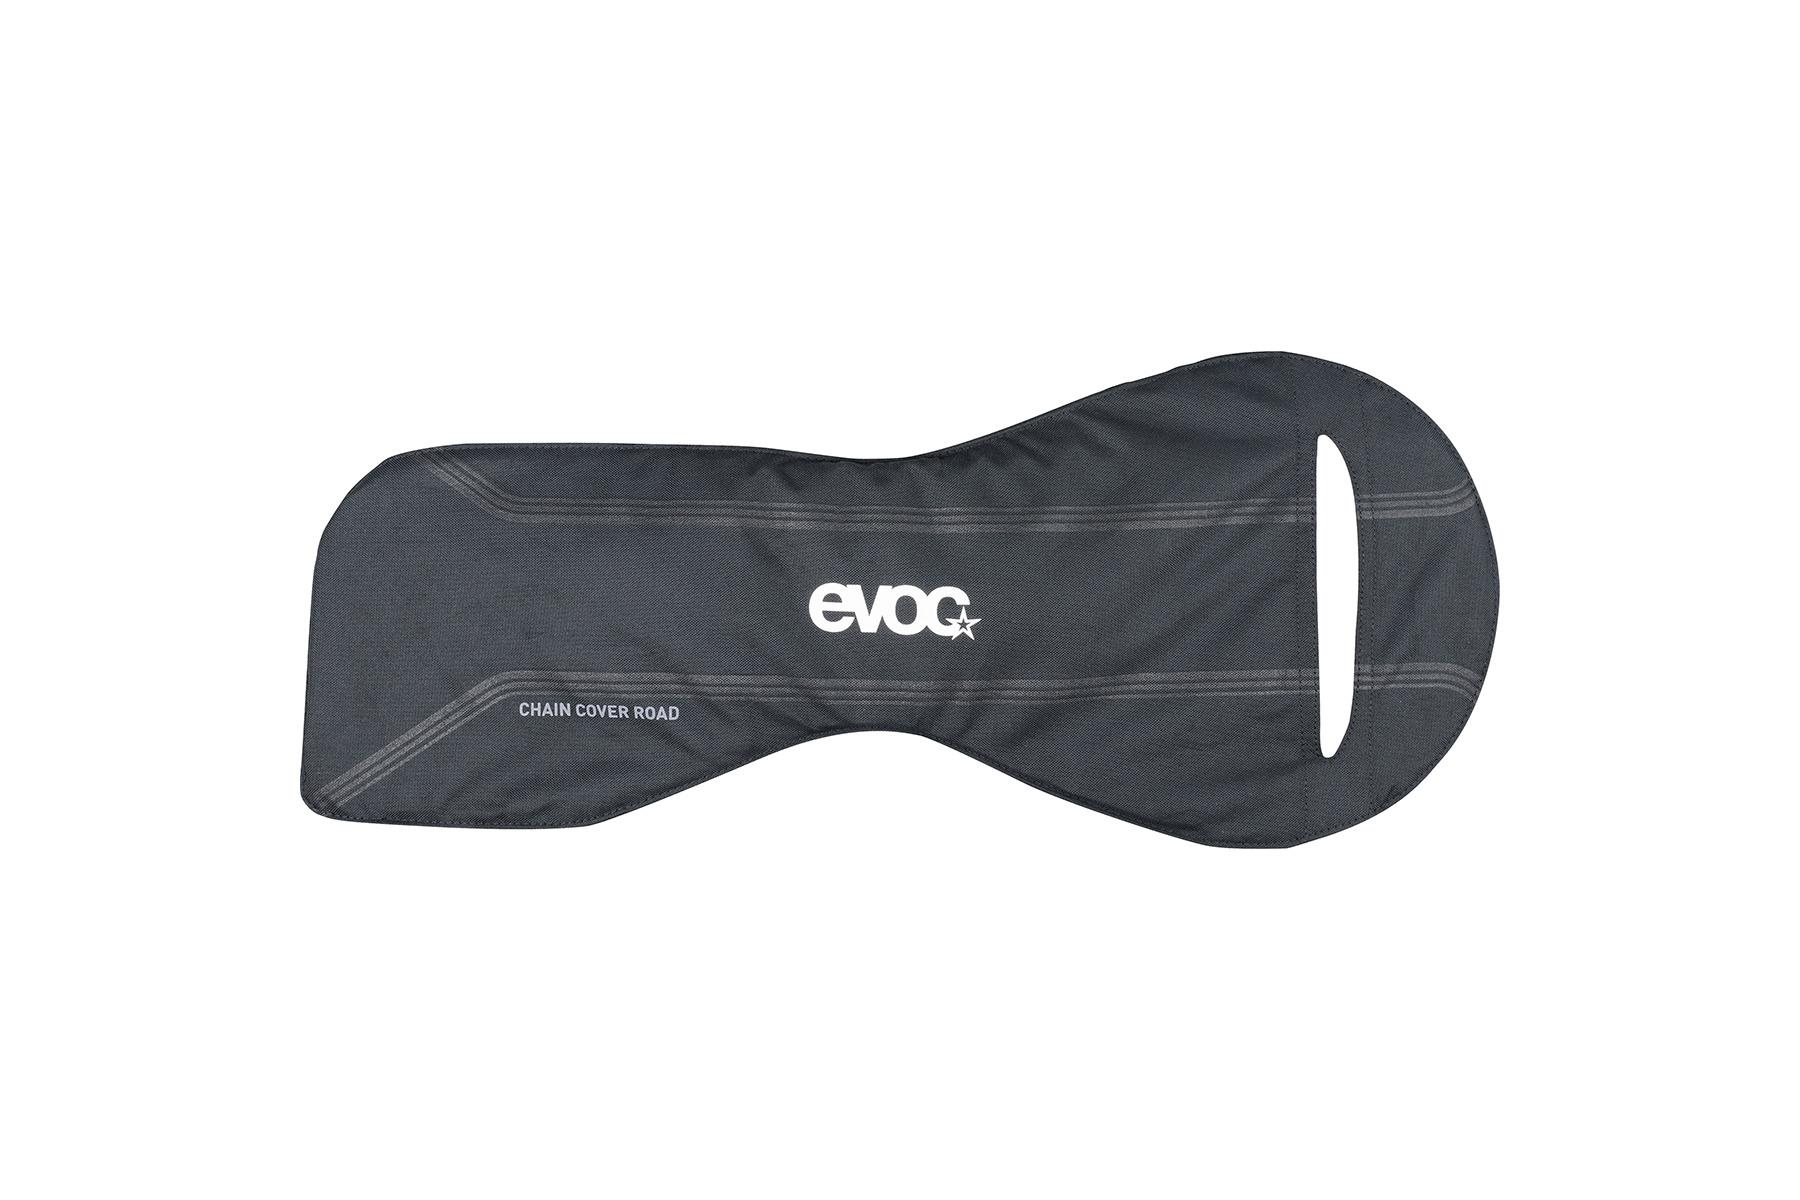 evoc CHAIN COVER ROAD Fahrradkettenschutztasche